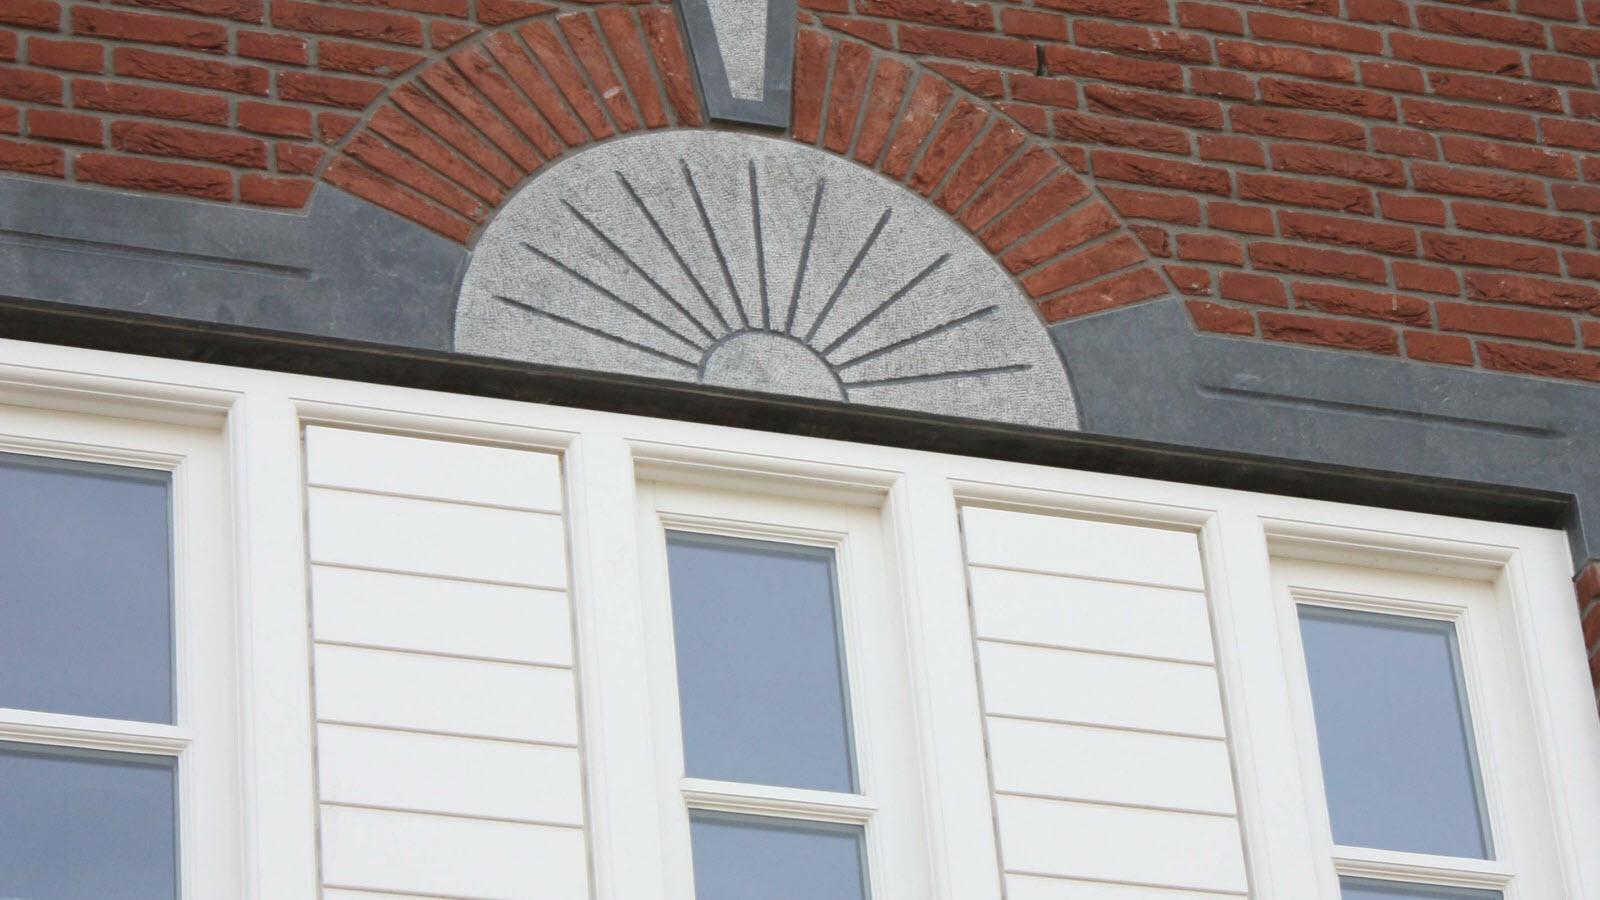 Parkhagen Sint Michielsgestel (6)